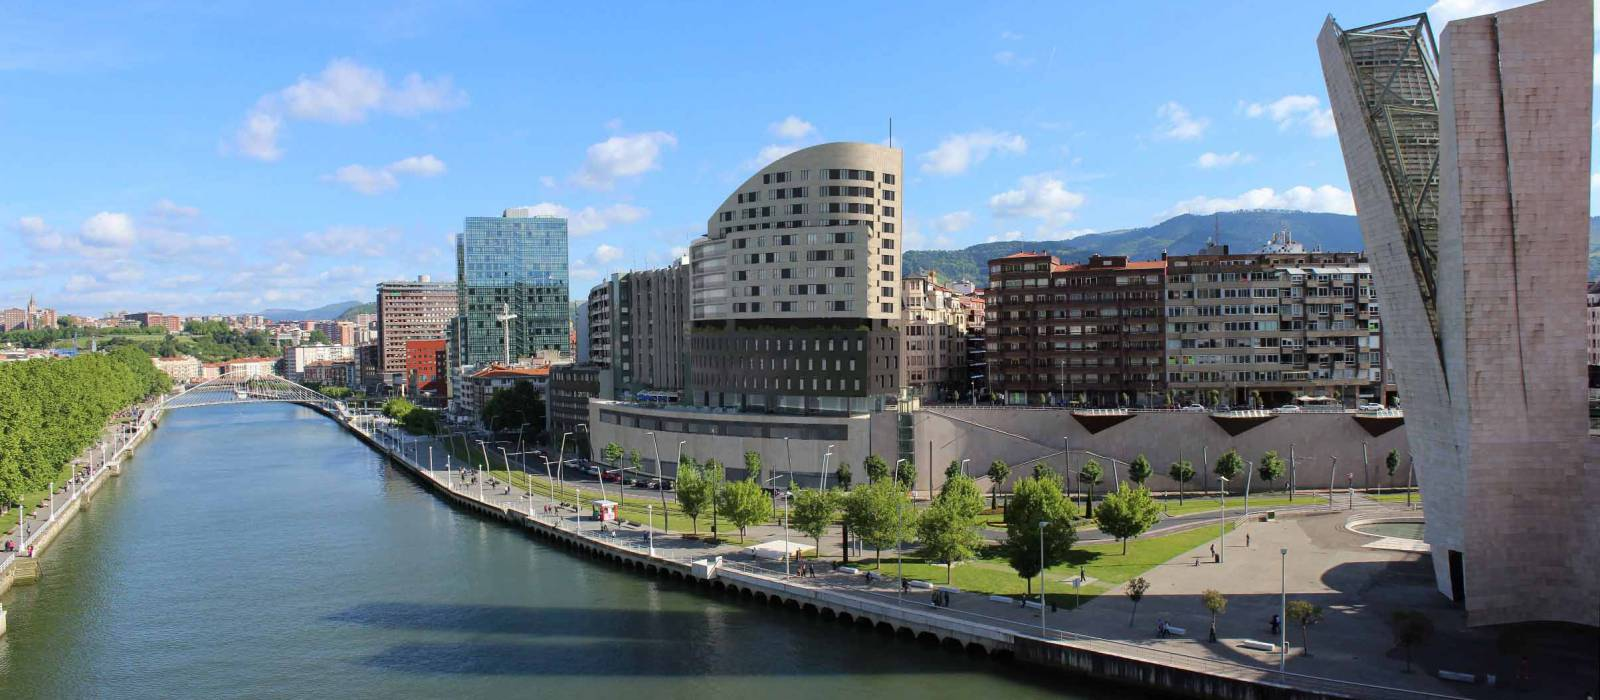 Hotel Bilbao - Fachada